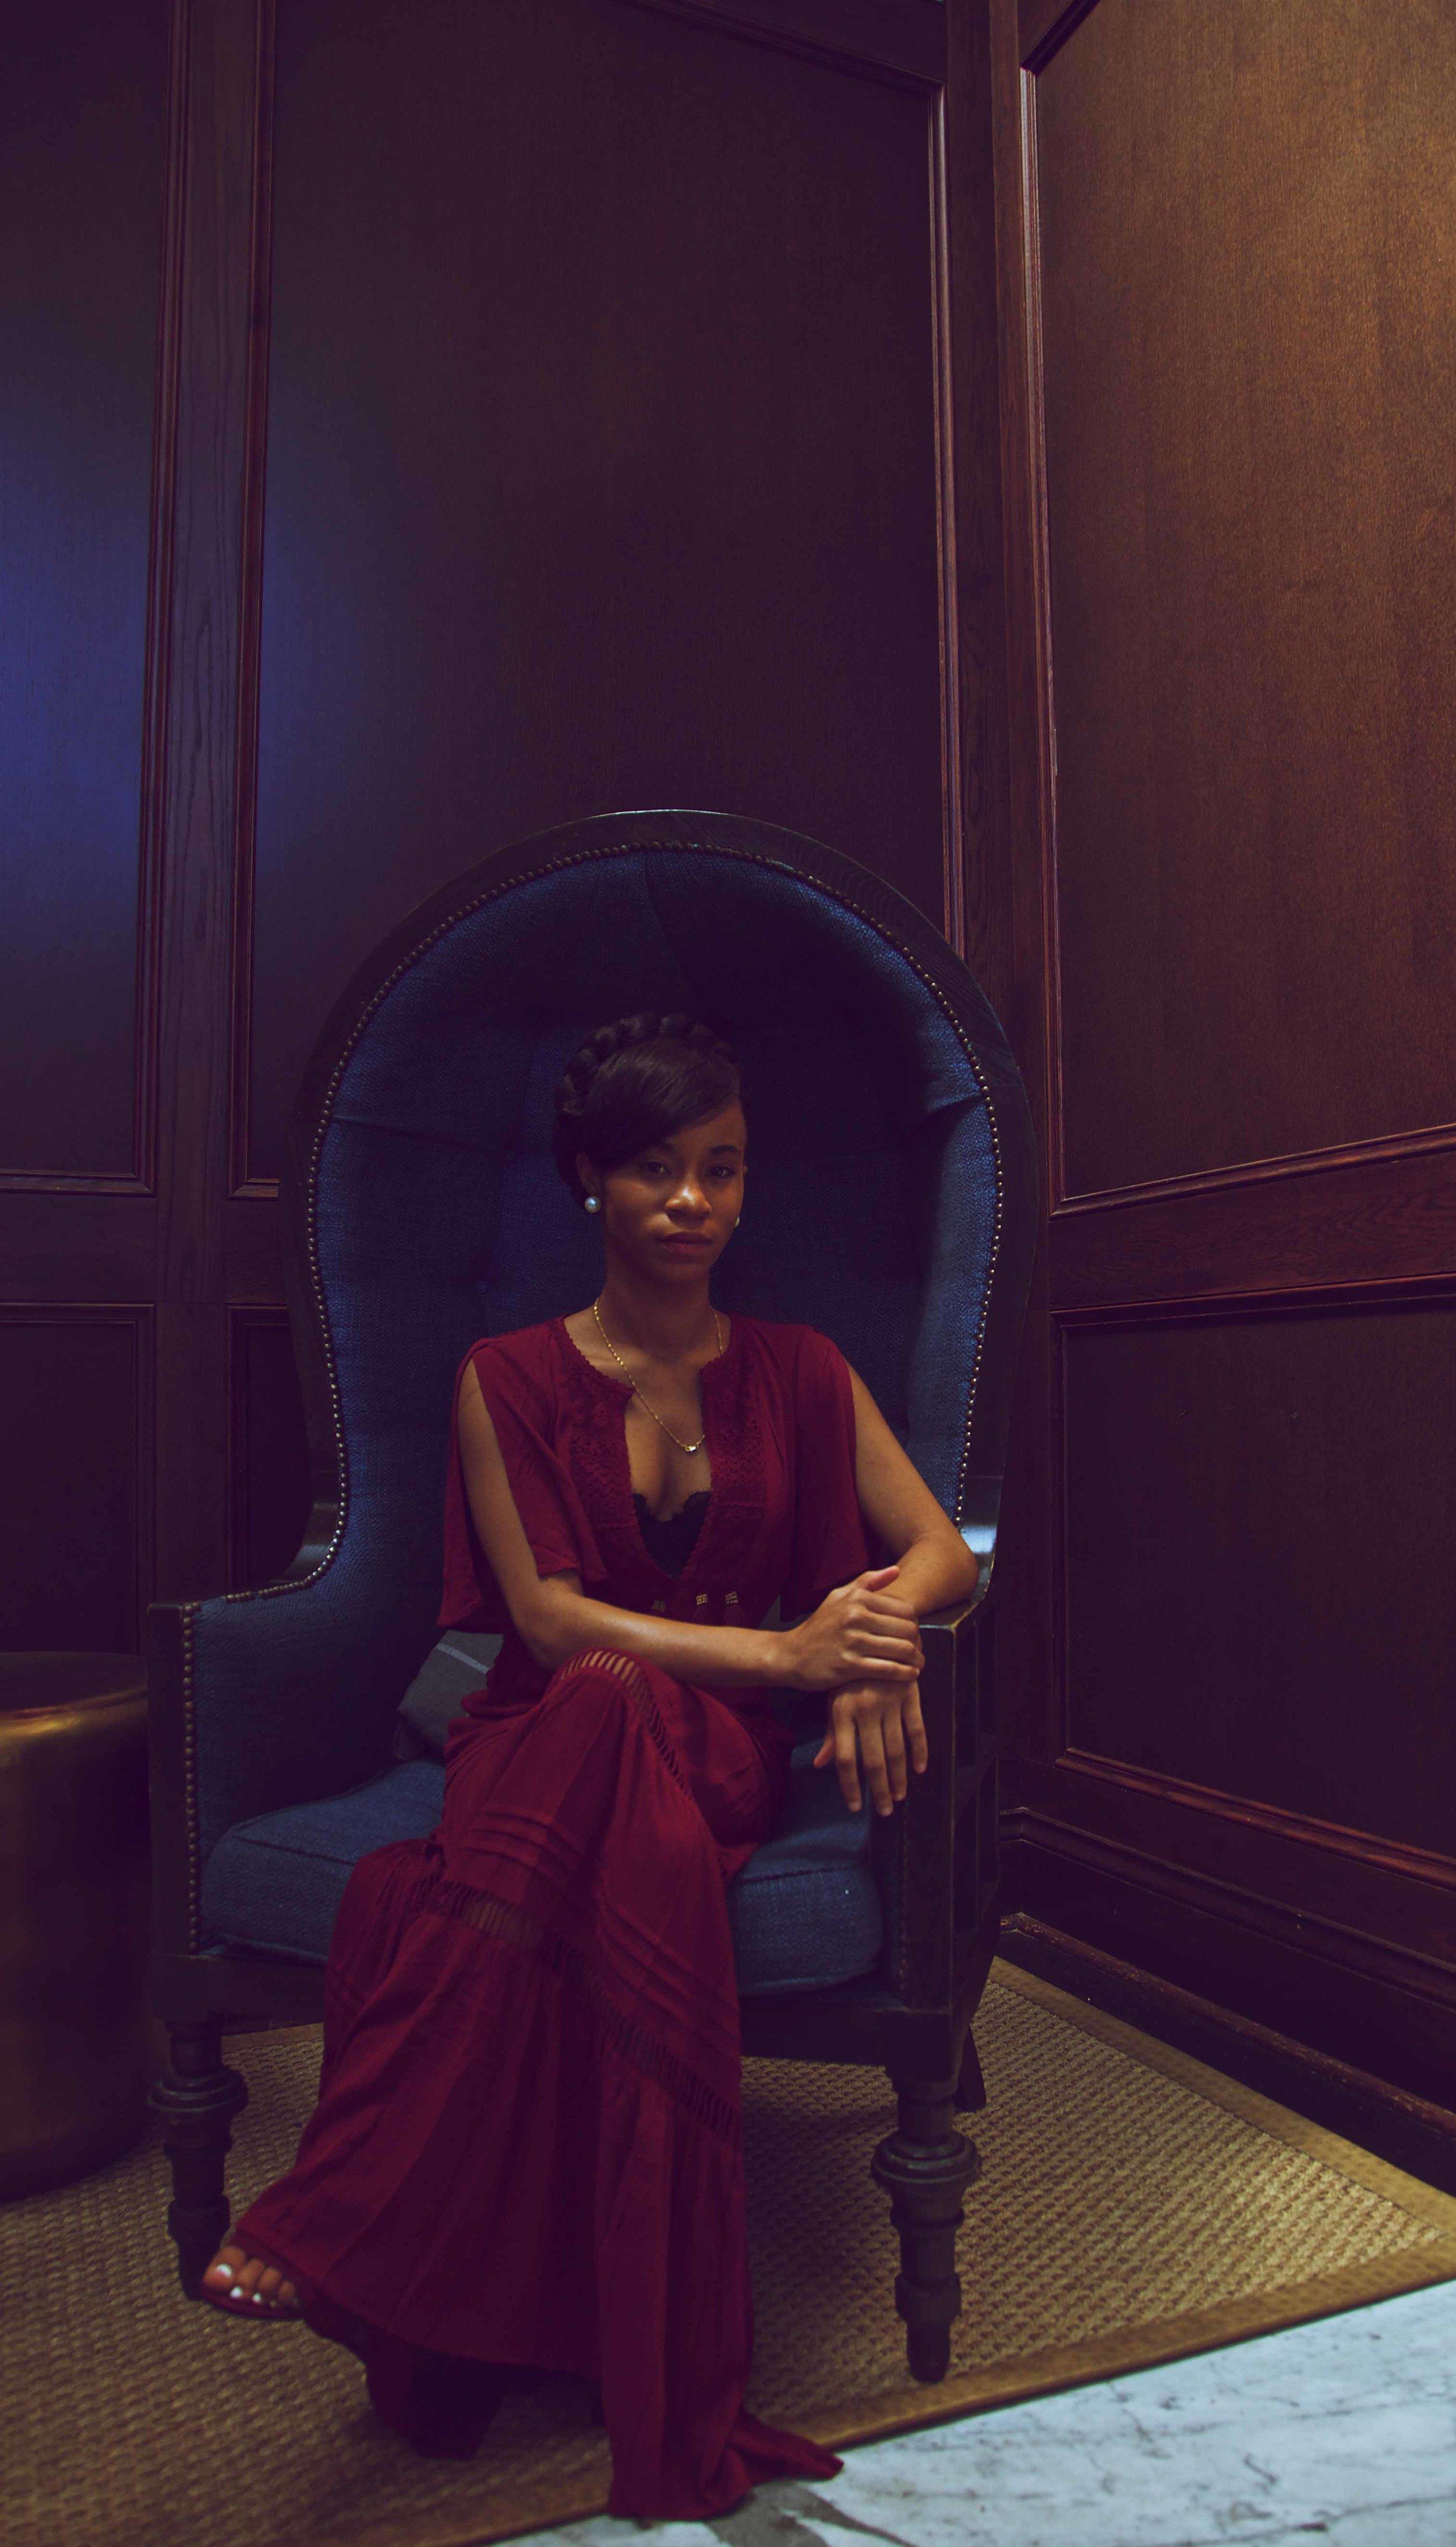 2018.3.3 Kayla Boronell by StanChambersJr Photography 9 small.jpg